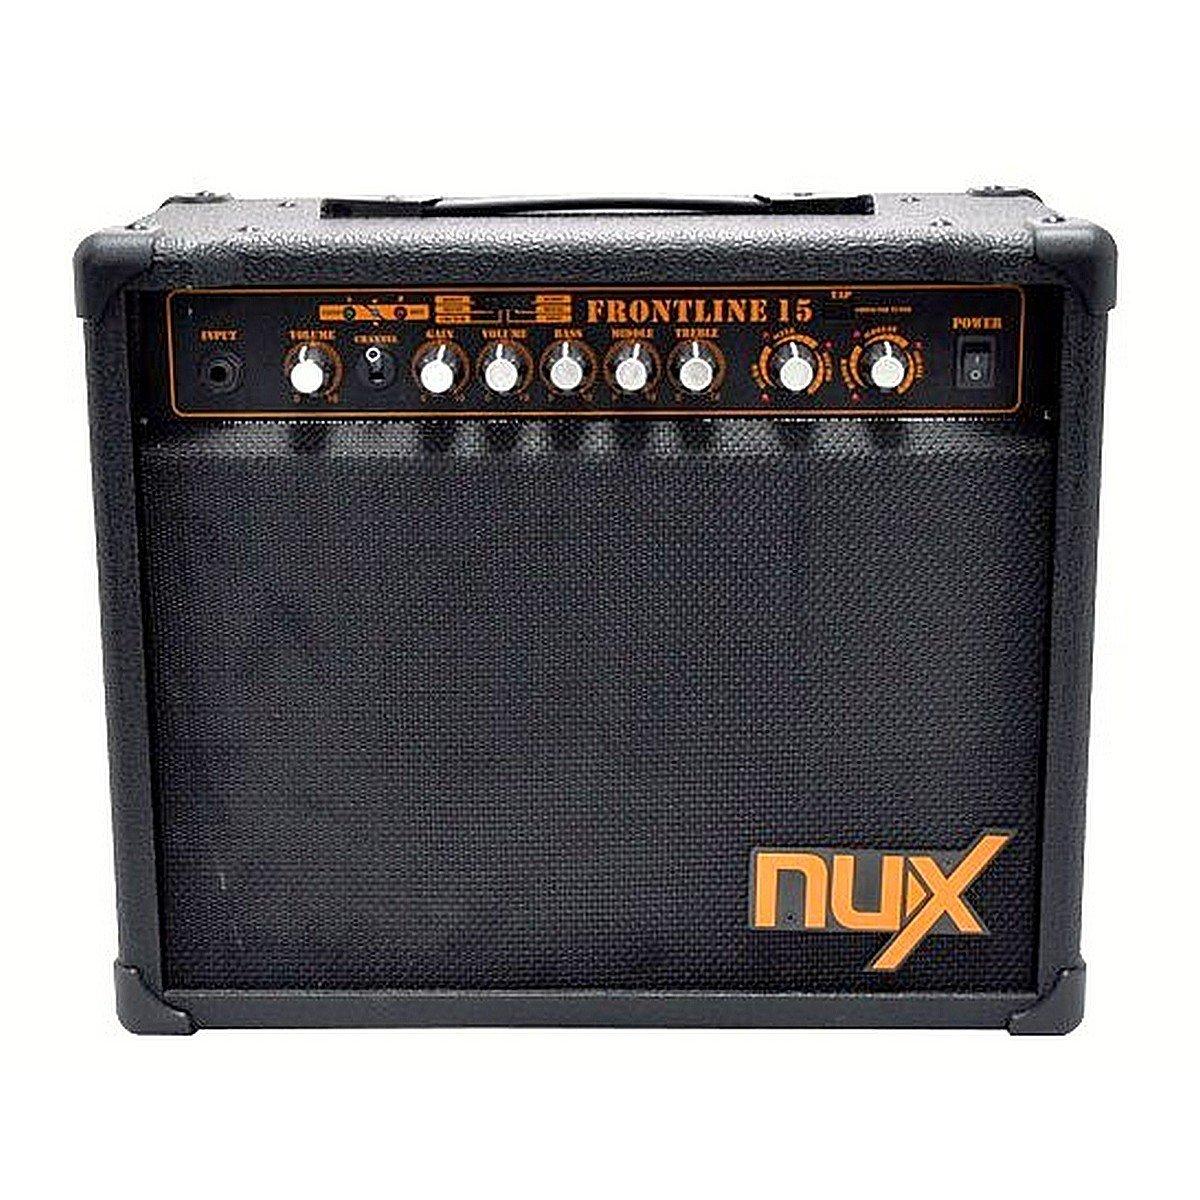 NUX Frontline 15 Electric Guitar Amplifier 15-Watt Clean and Distortion